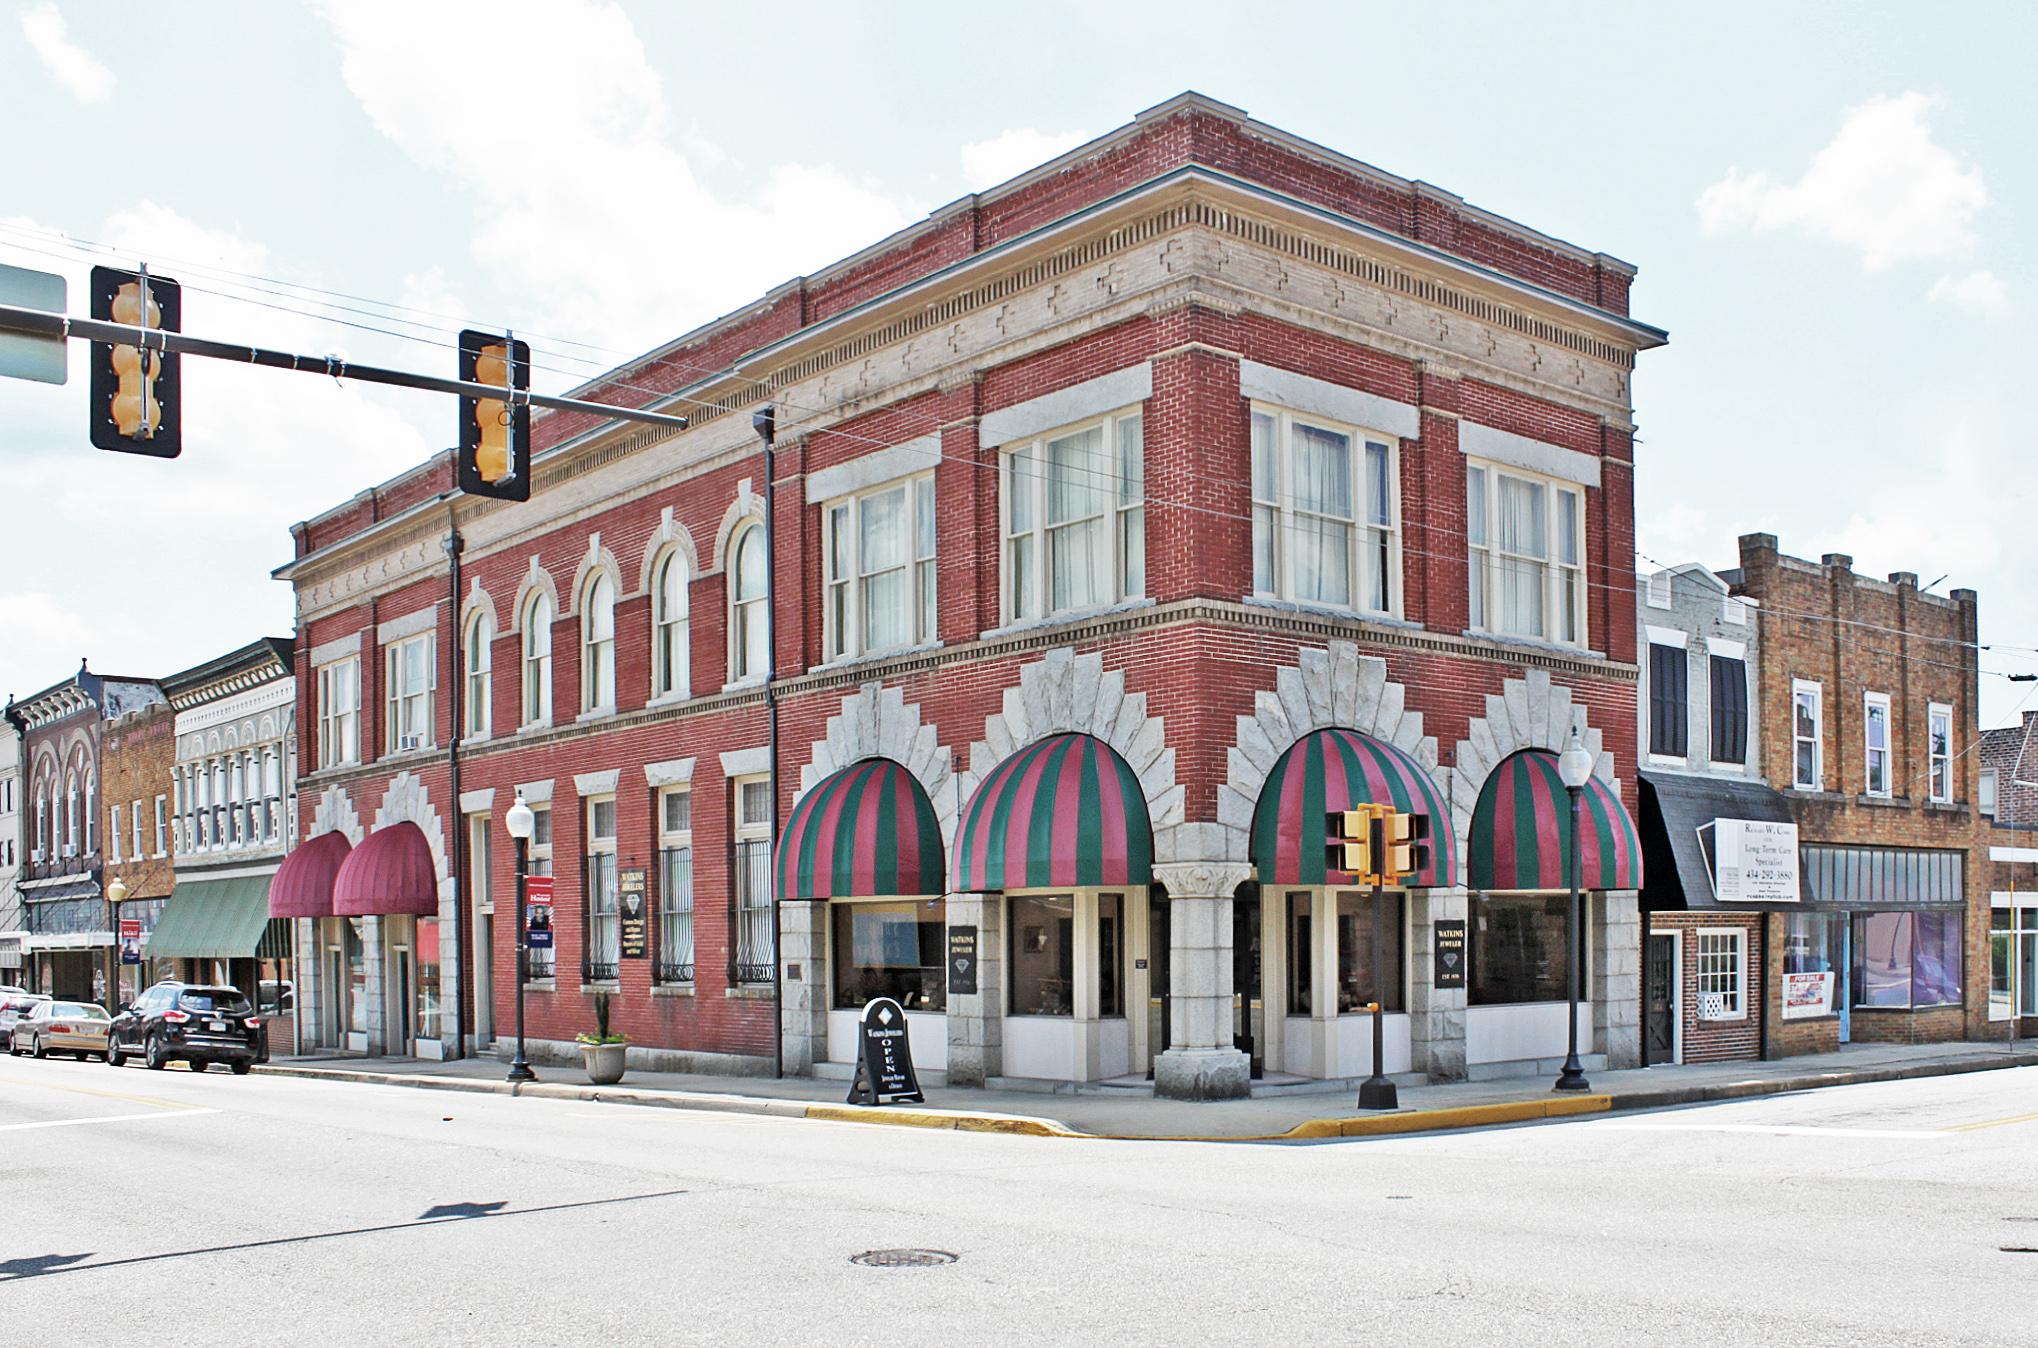 Blackstone Historic District